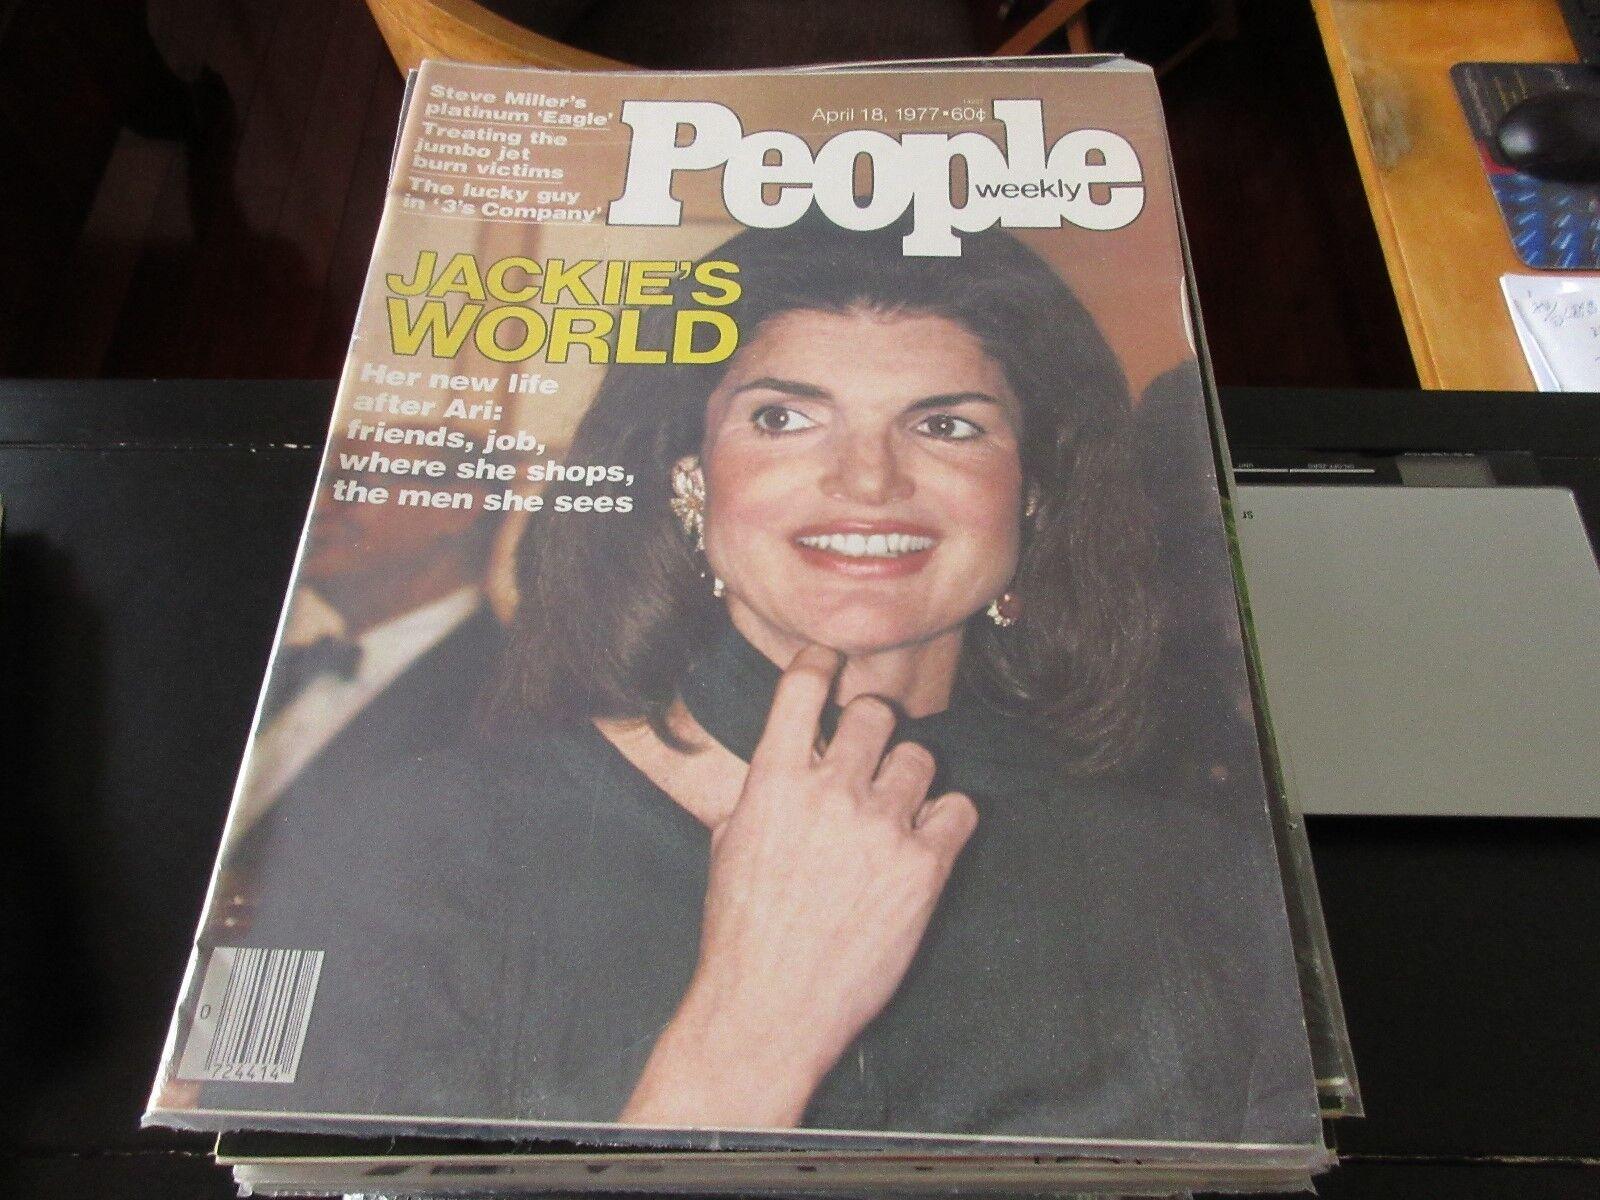 Jackie's World , People Weekly , 4/18/77 , 3's Company